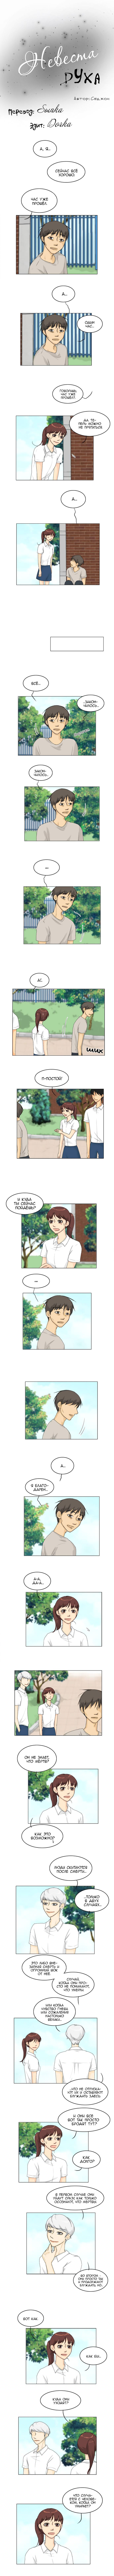 https://r2.ninemanga.com/comics/pic3/8/31048/1295162/1546305876578.jpg Page 1